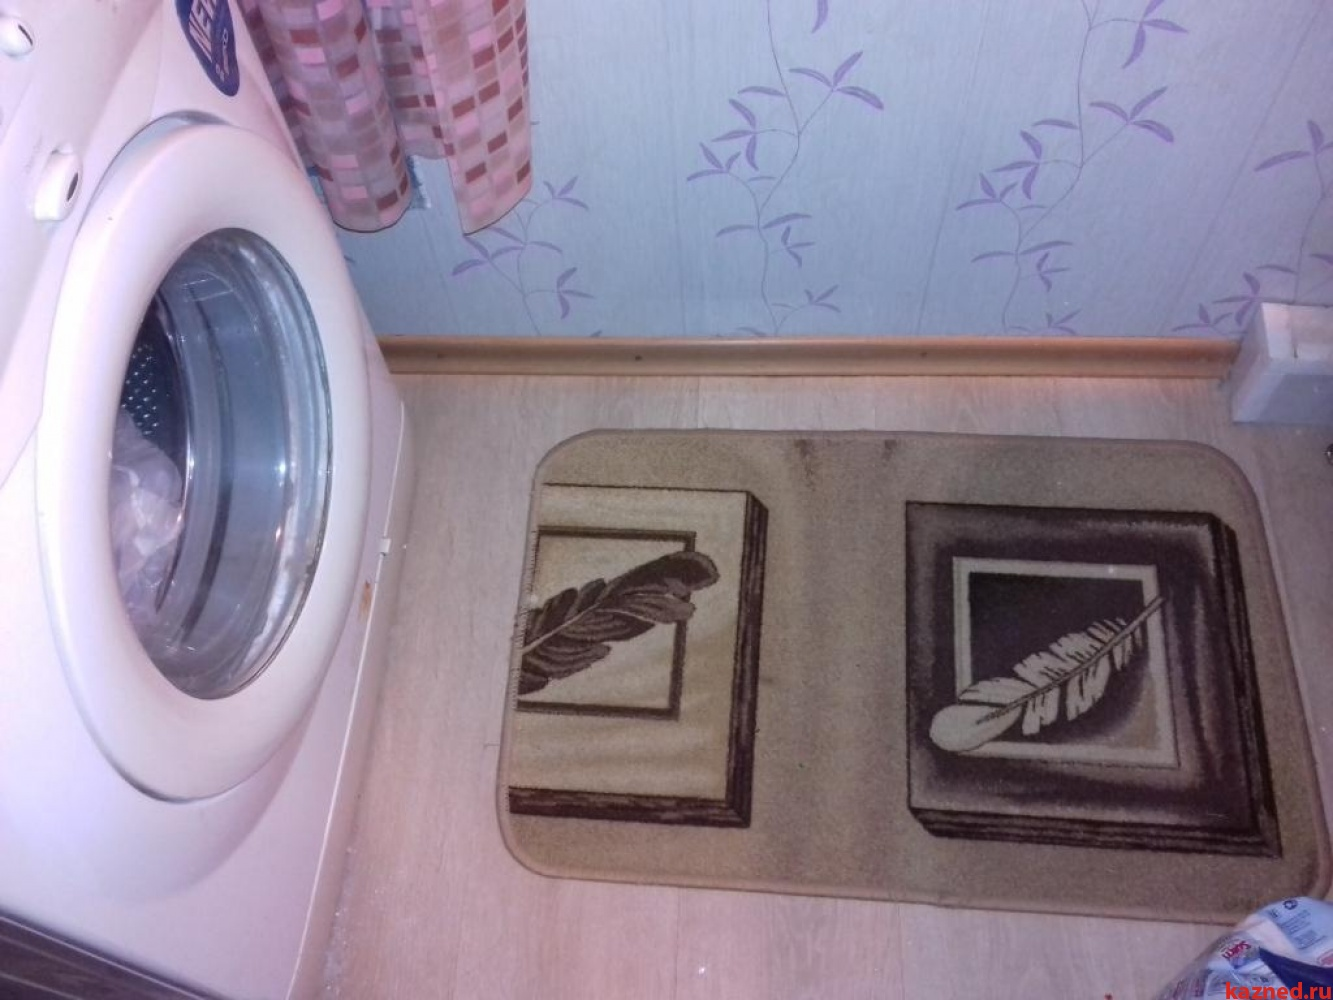 Продажа 3-к квартиры Лукина, 16, 69 м² (миниатюра №17)